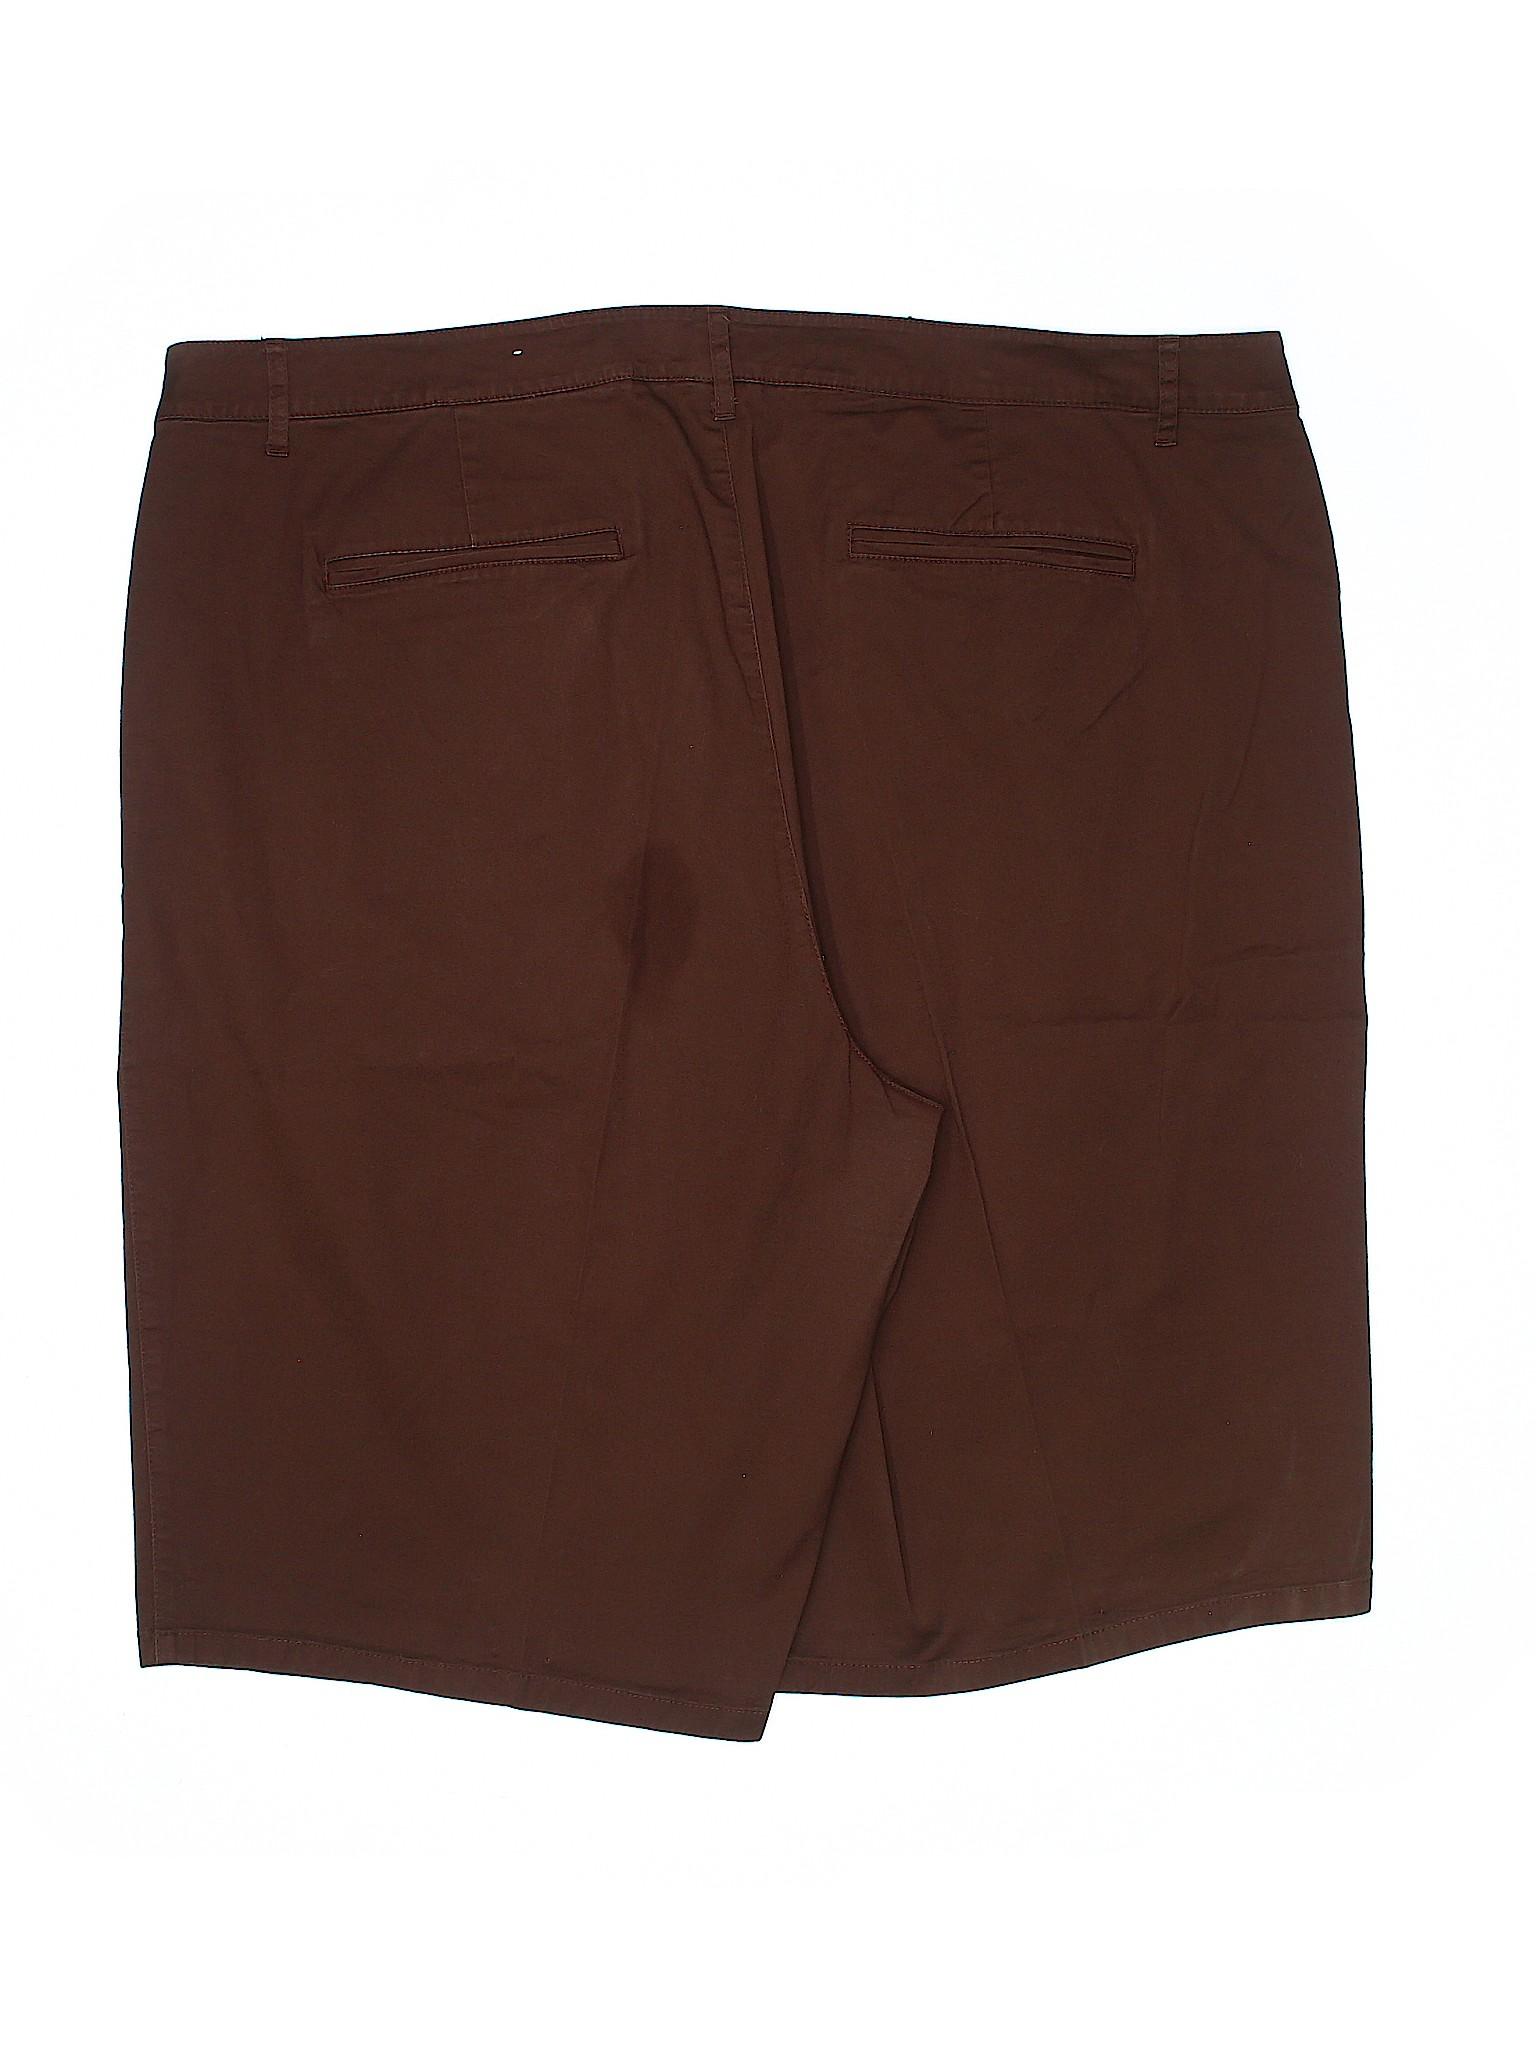 Boutique Boutique Boutique Shorts Shorts DressBarn Shorts Boutique DressBarn DressBarn HqdxwatEw